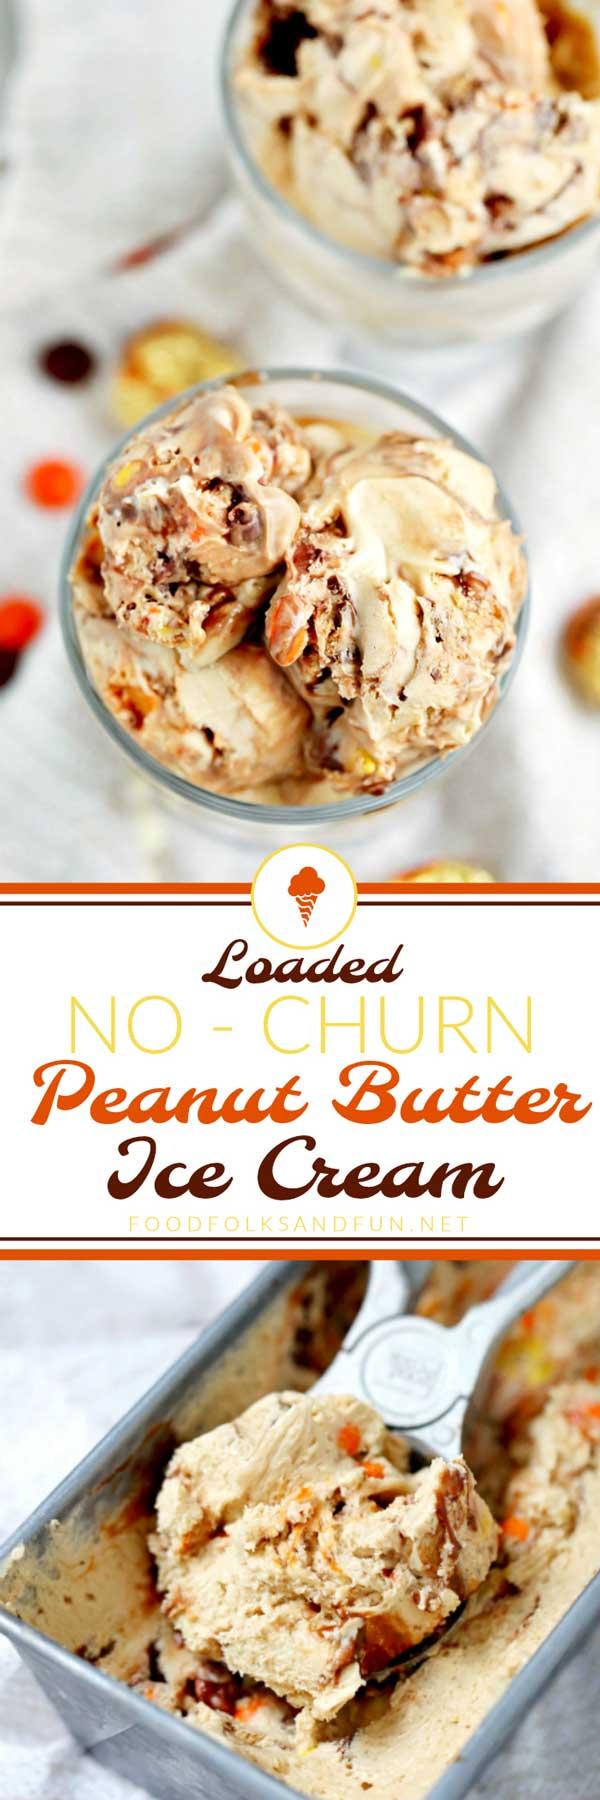 The Best Peanut Butter Ice Cream